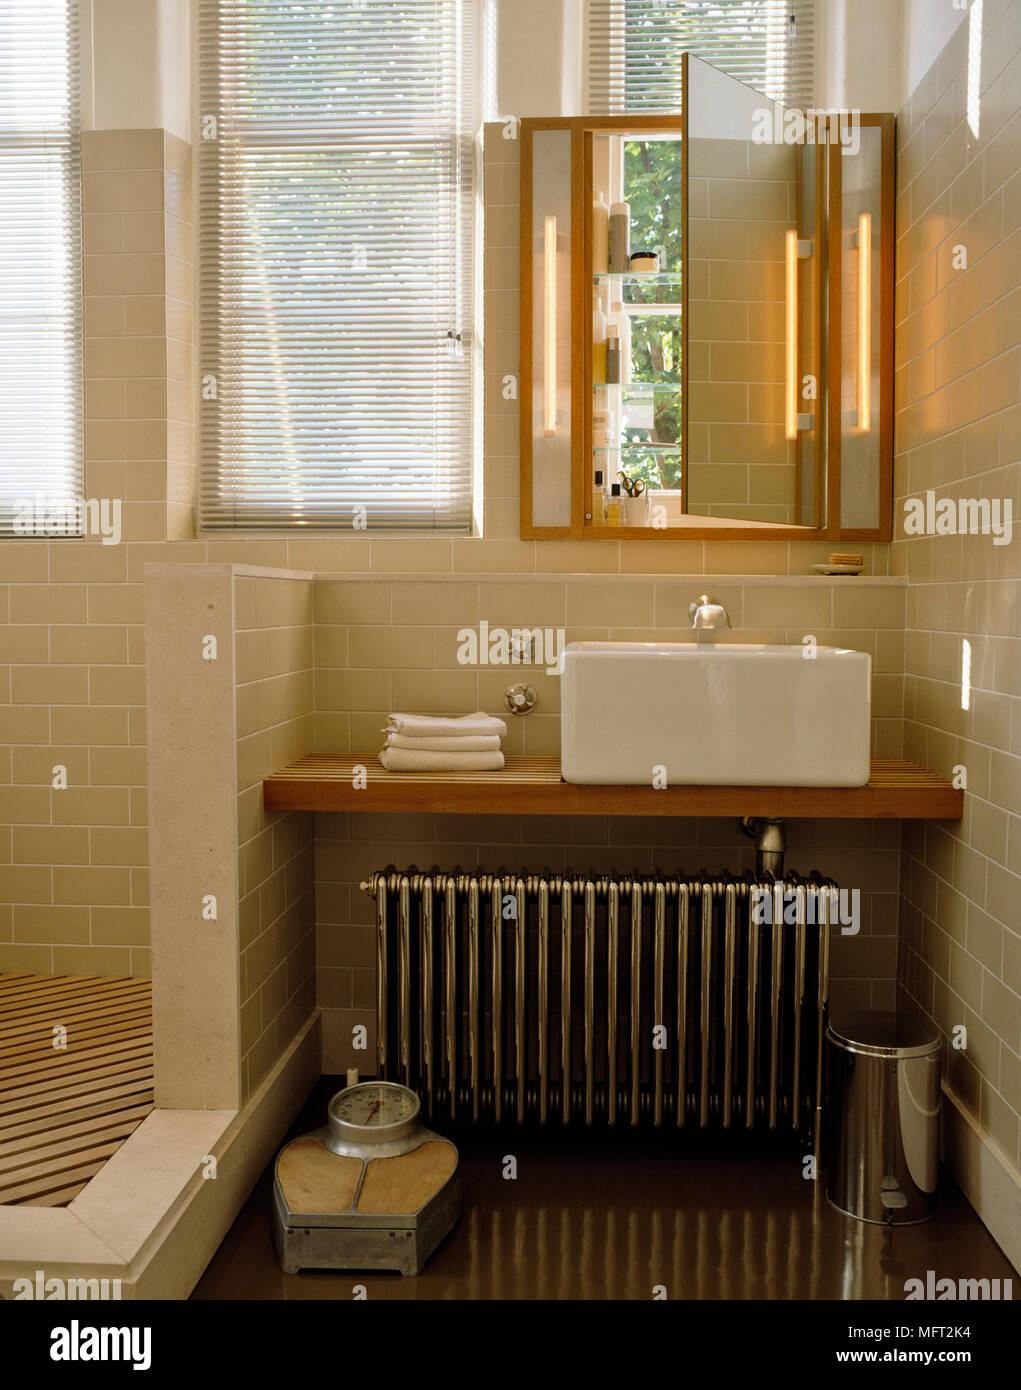 Square washbasin on wooden shelf above radiator next to shower area ...